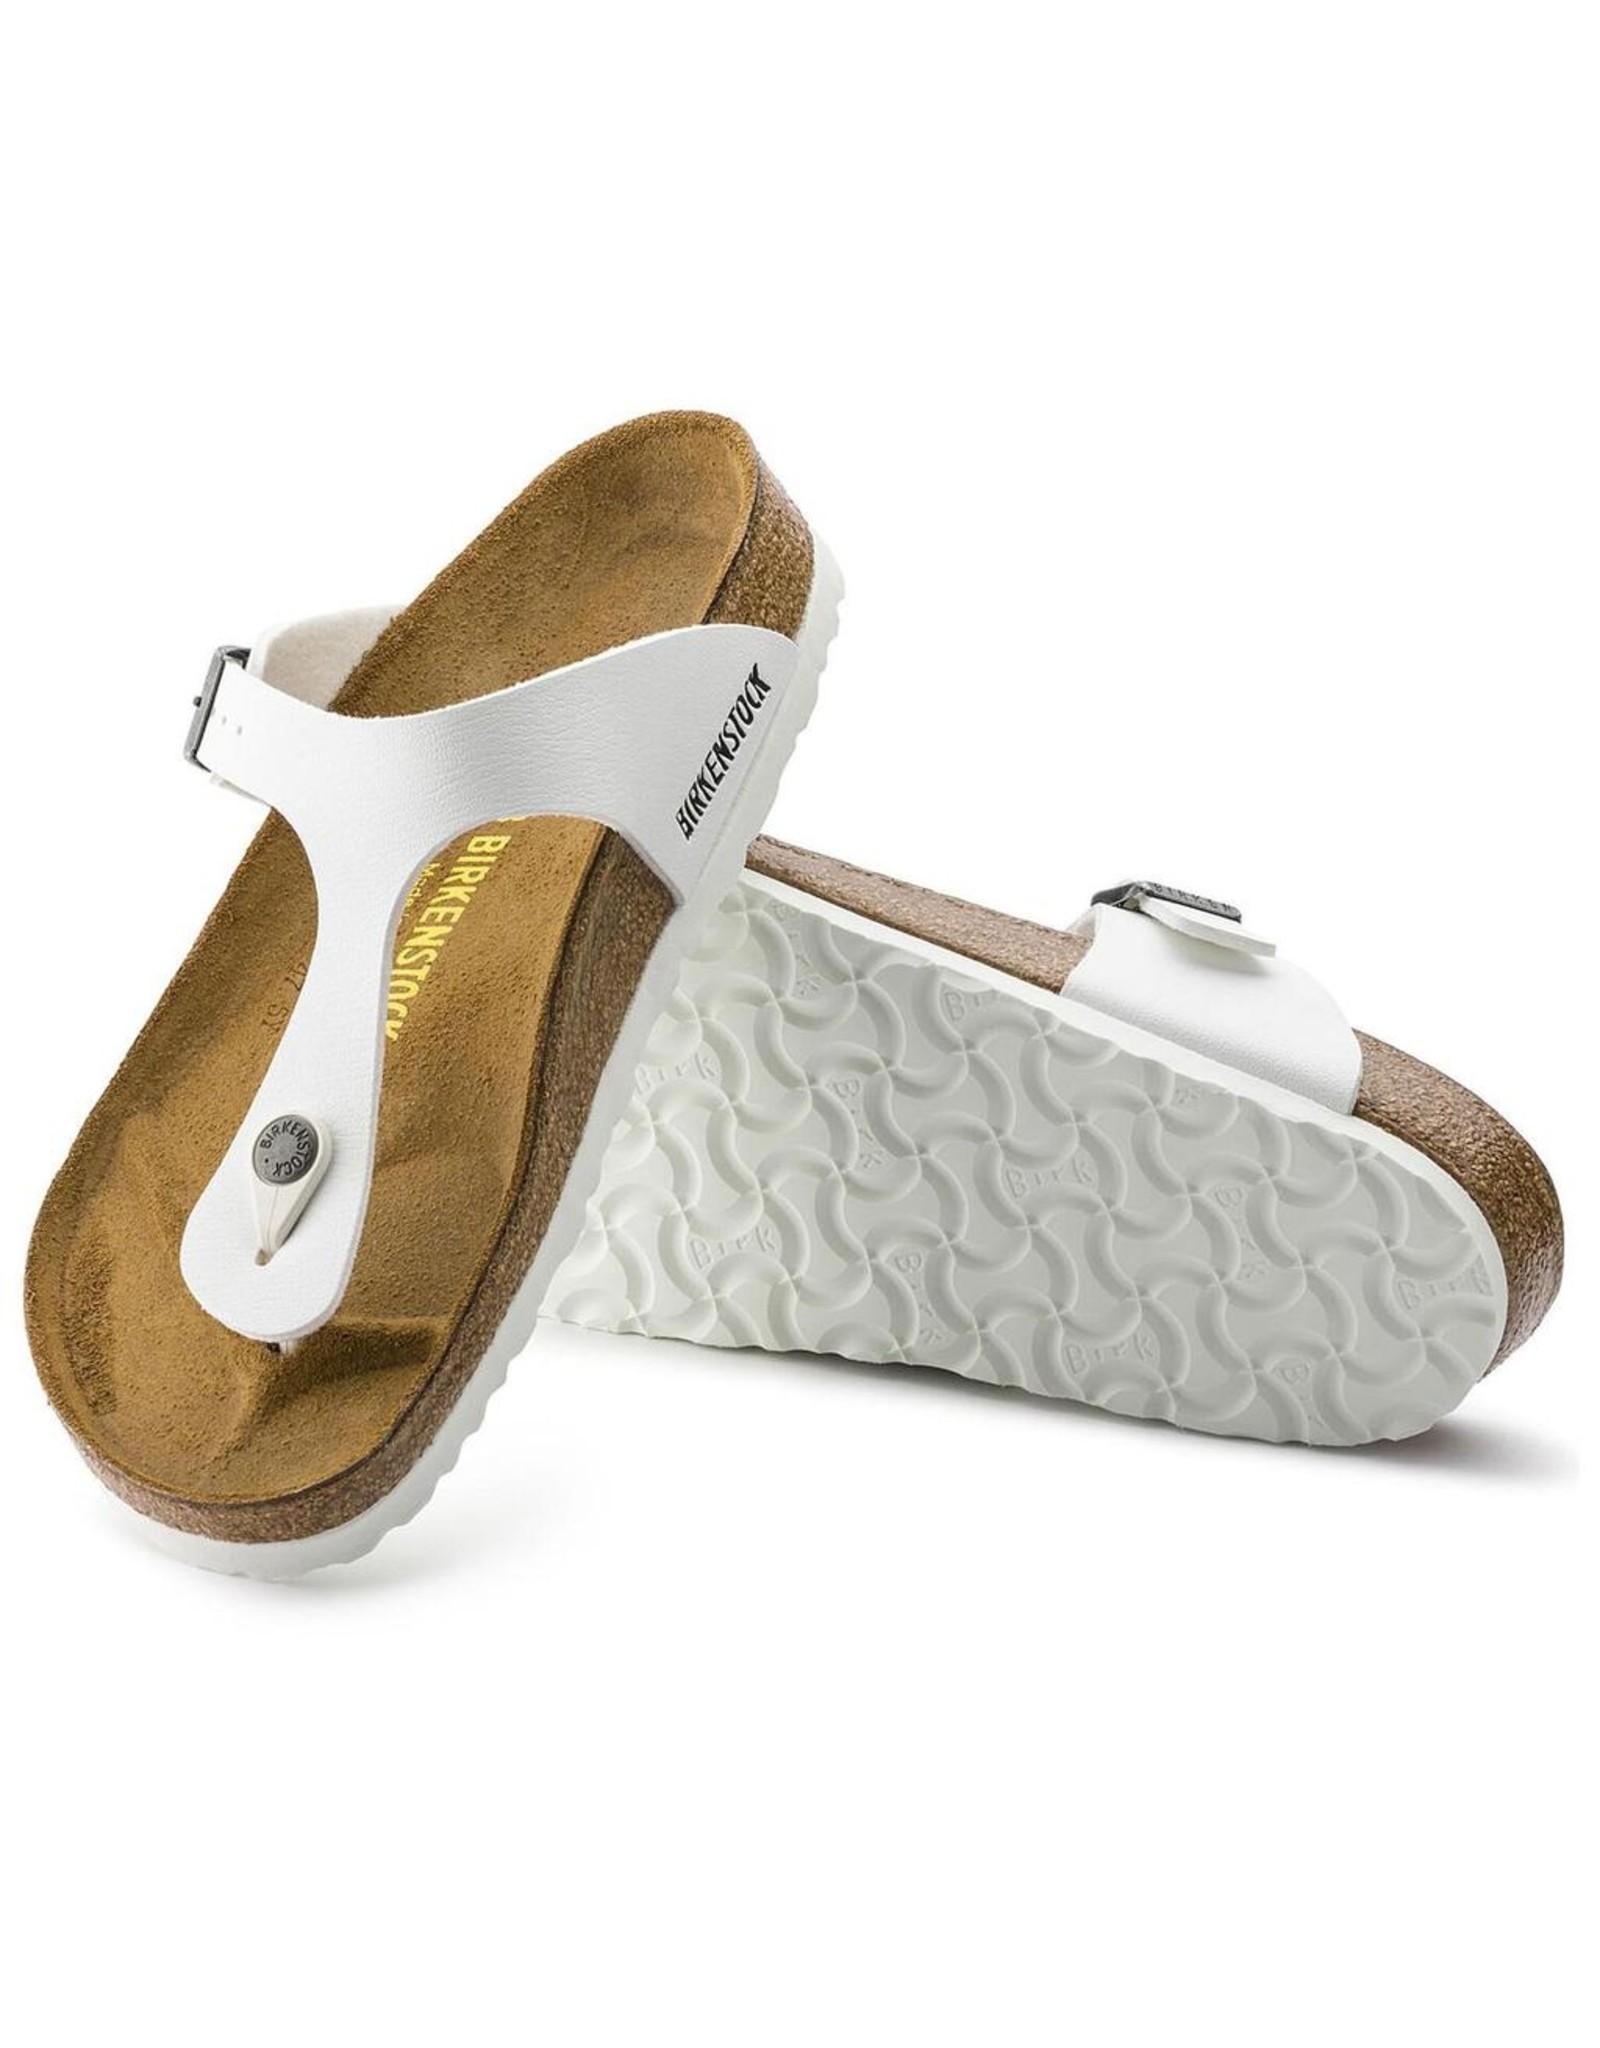 Birkenstock White Birko-Flor Gizeh Sandal